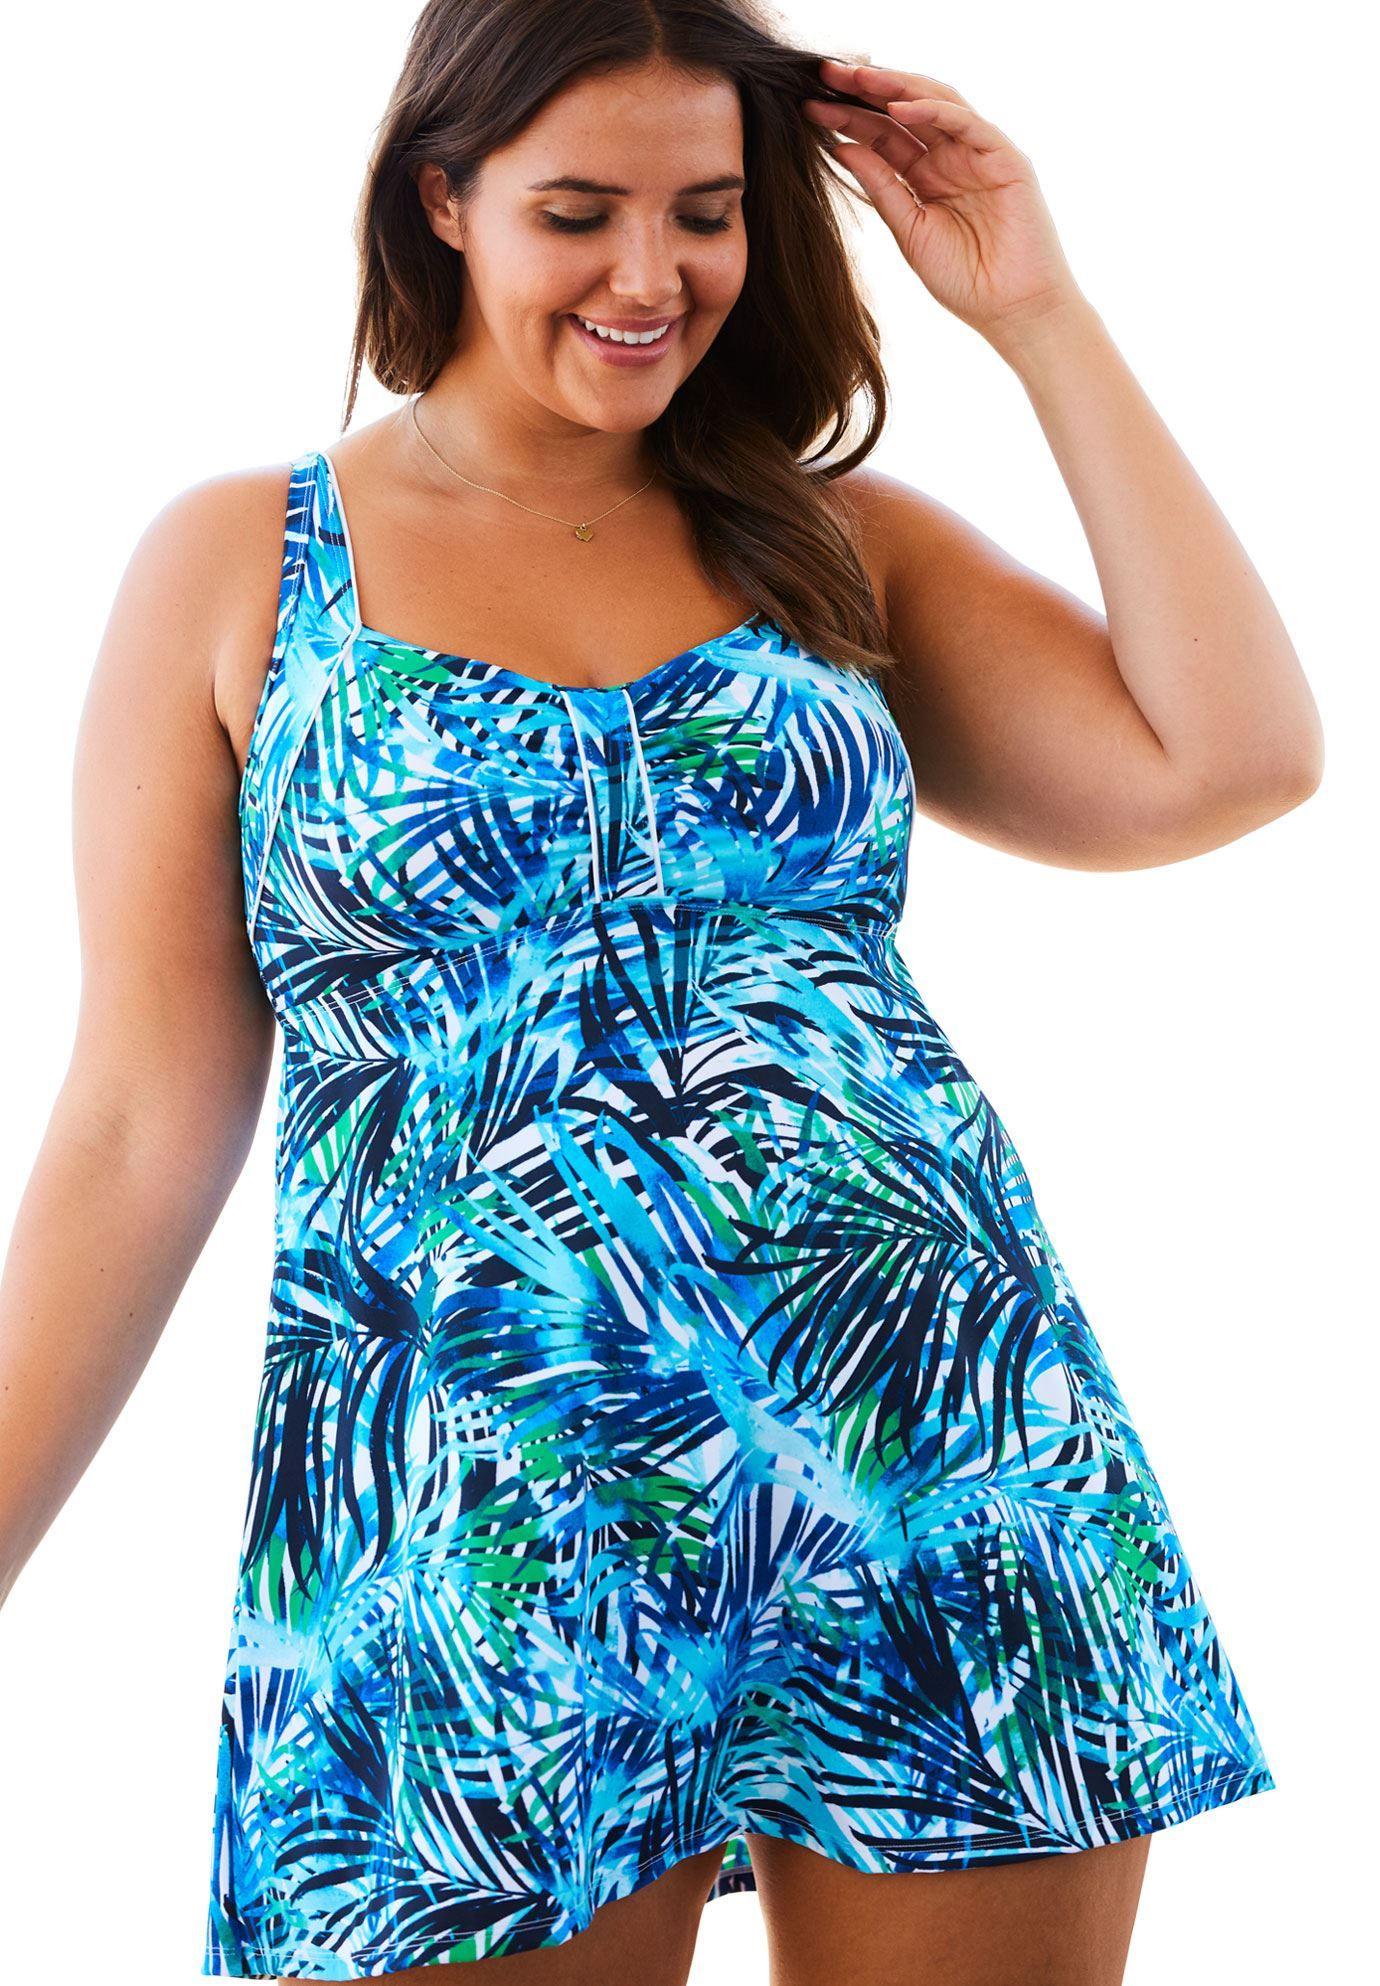 881f11d0824 Swim 365 Retro Swimdress - Women's Plus Size Clothing | Products ...